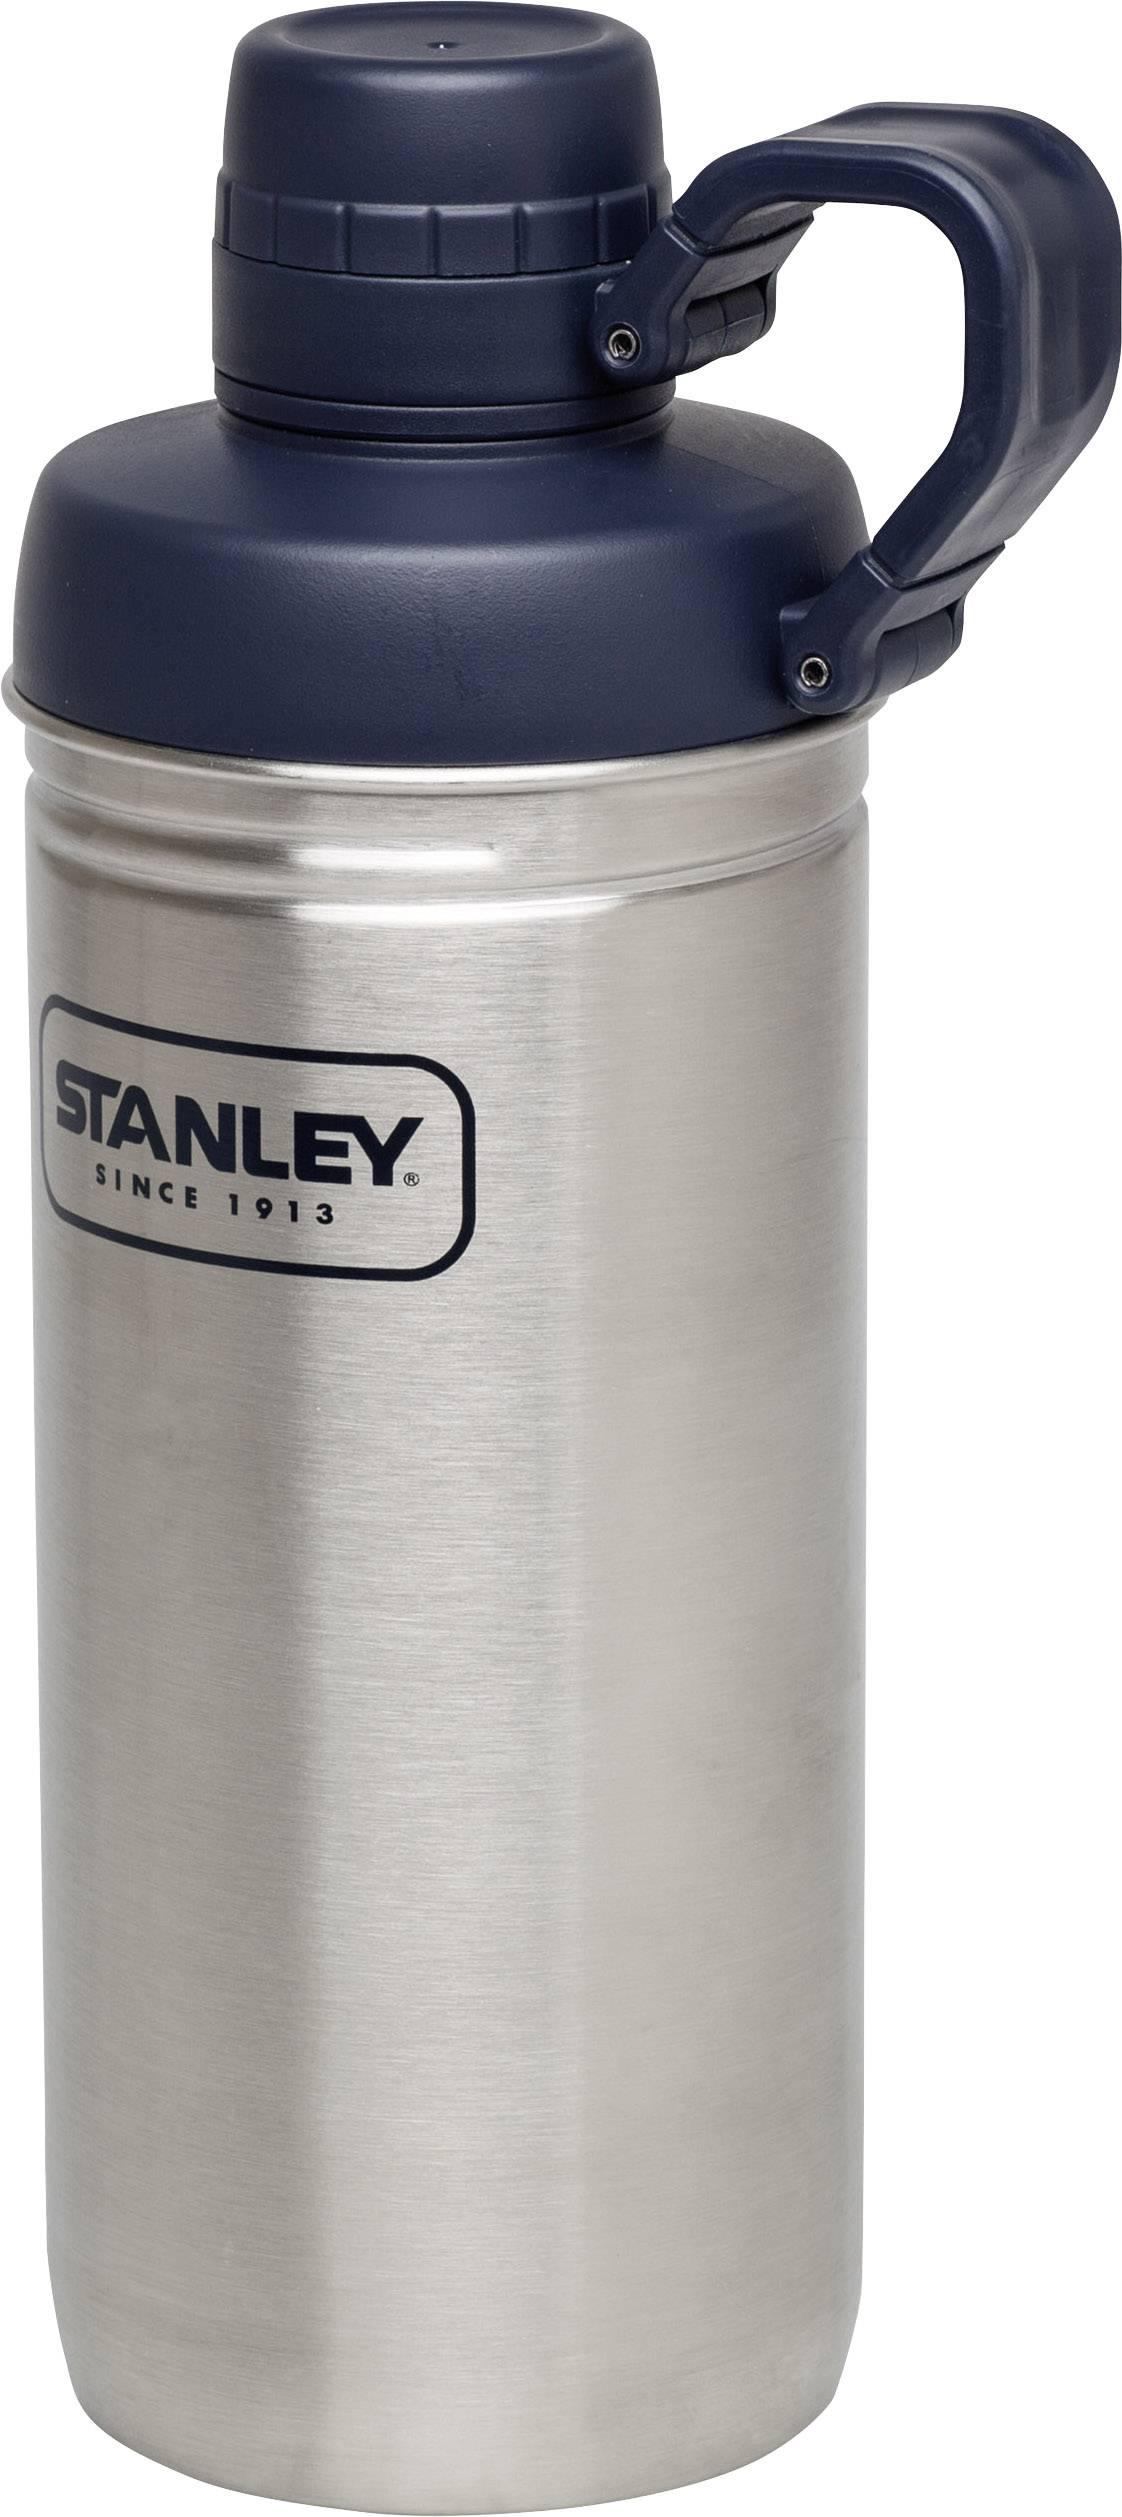 Stanley lahev 621 ml nerezová ocel 10-02112-001 Adventure Water Bottle